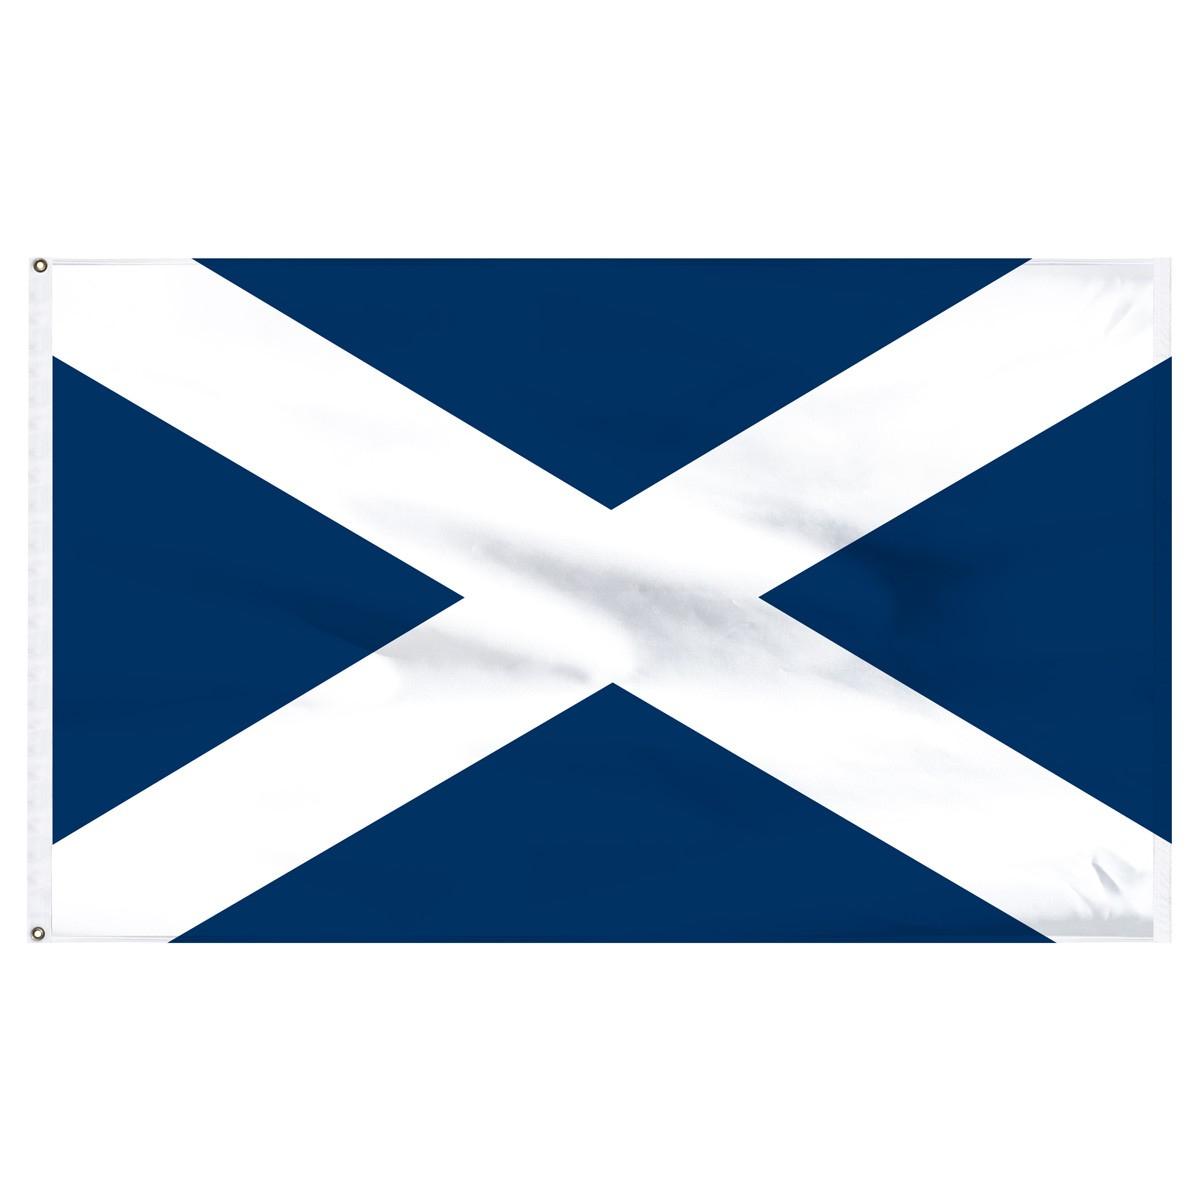 Secrets Picture Of The Scotland Flag Icon Circle Low Polygon Royalty - Free Printable Scottish Flag